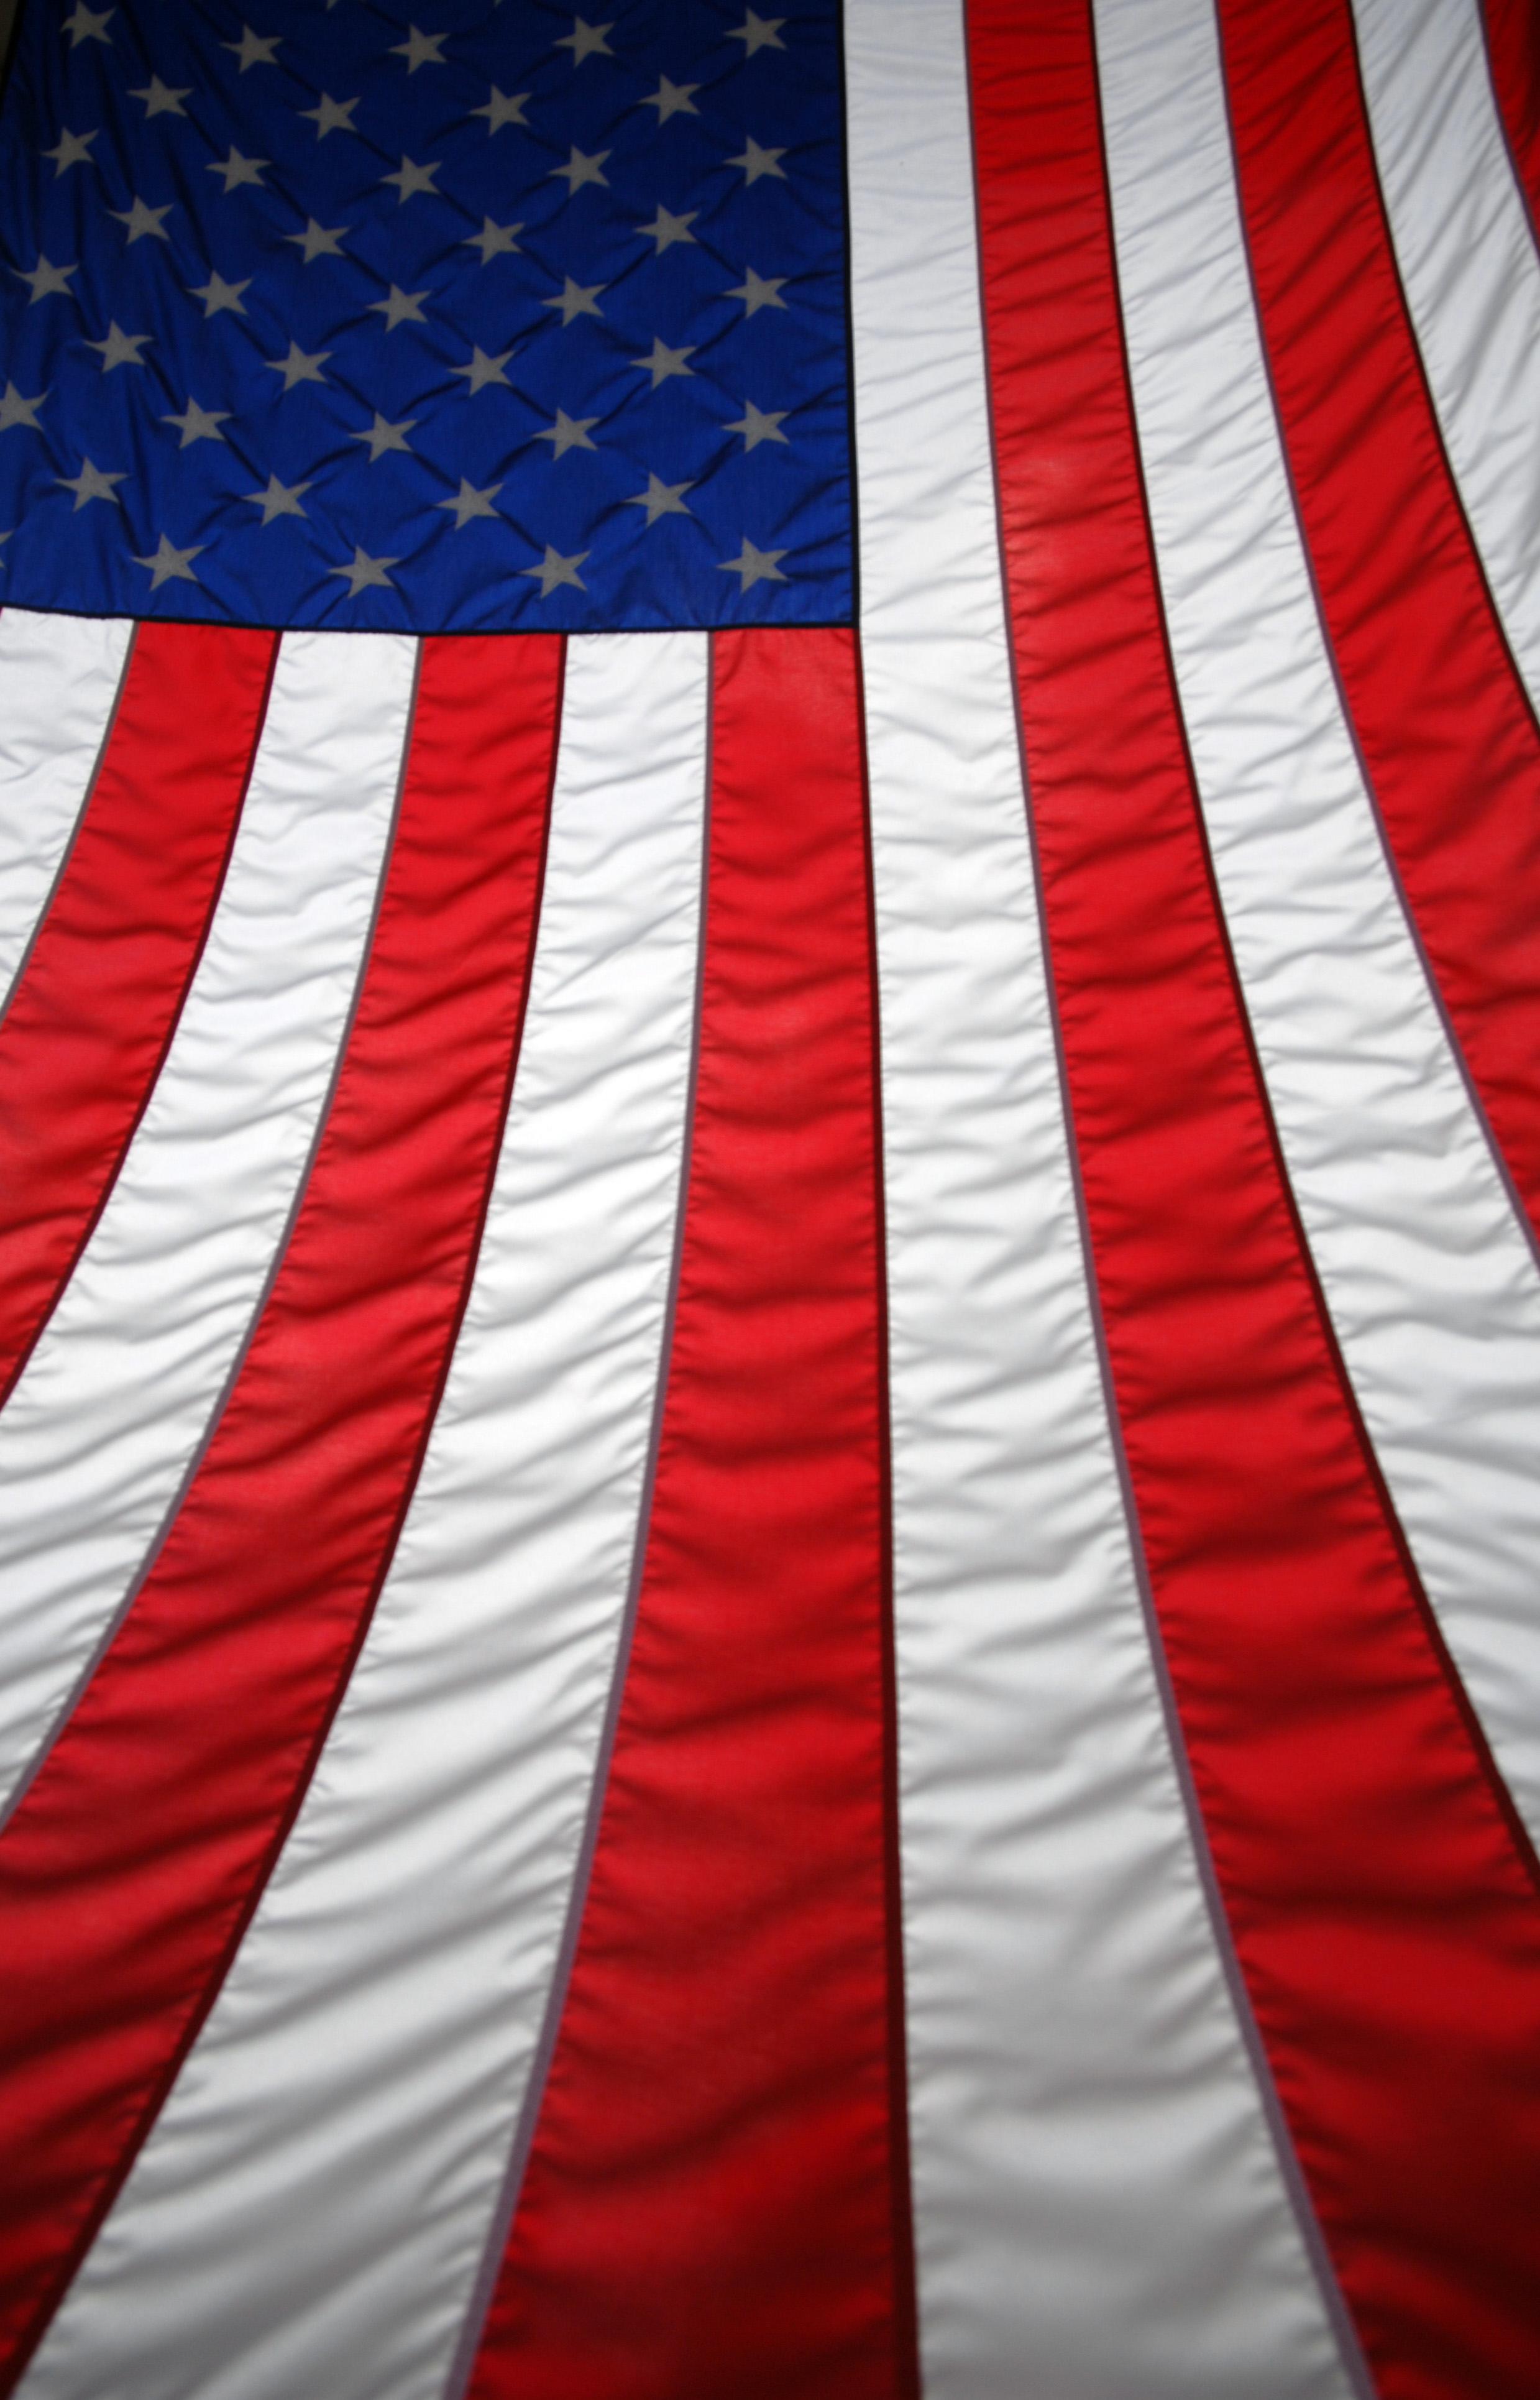 New US entrepreneur visa on its way